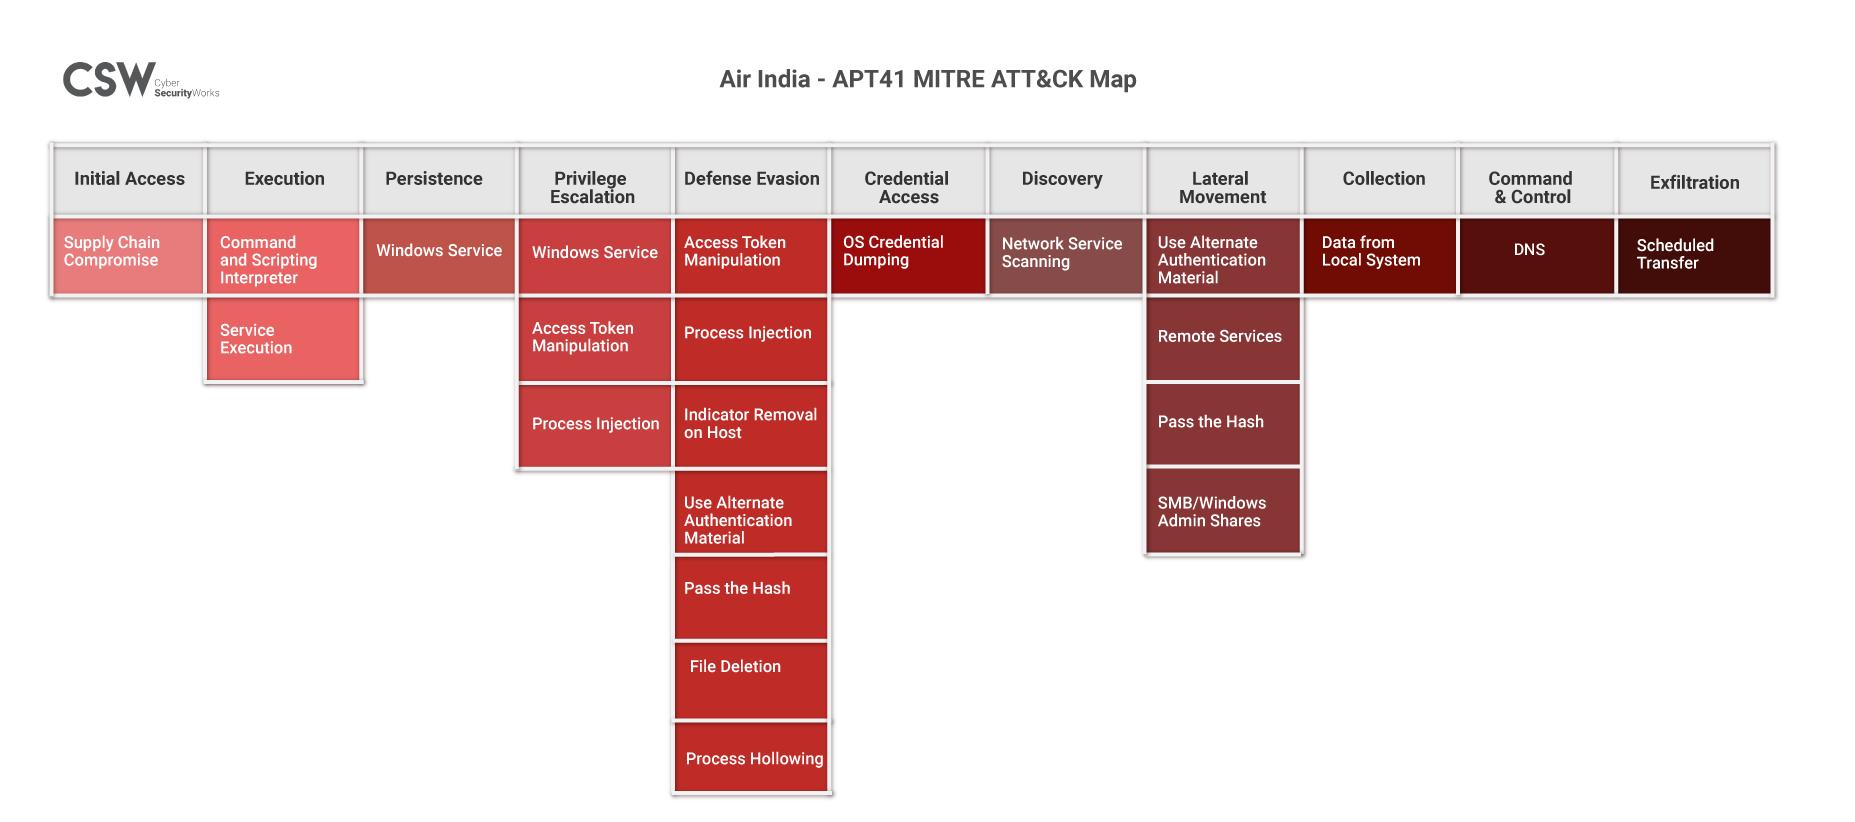 MITRE ATT&CK Map for APT 41 Air India Attack